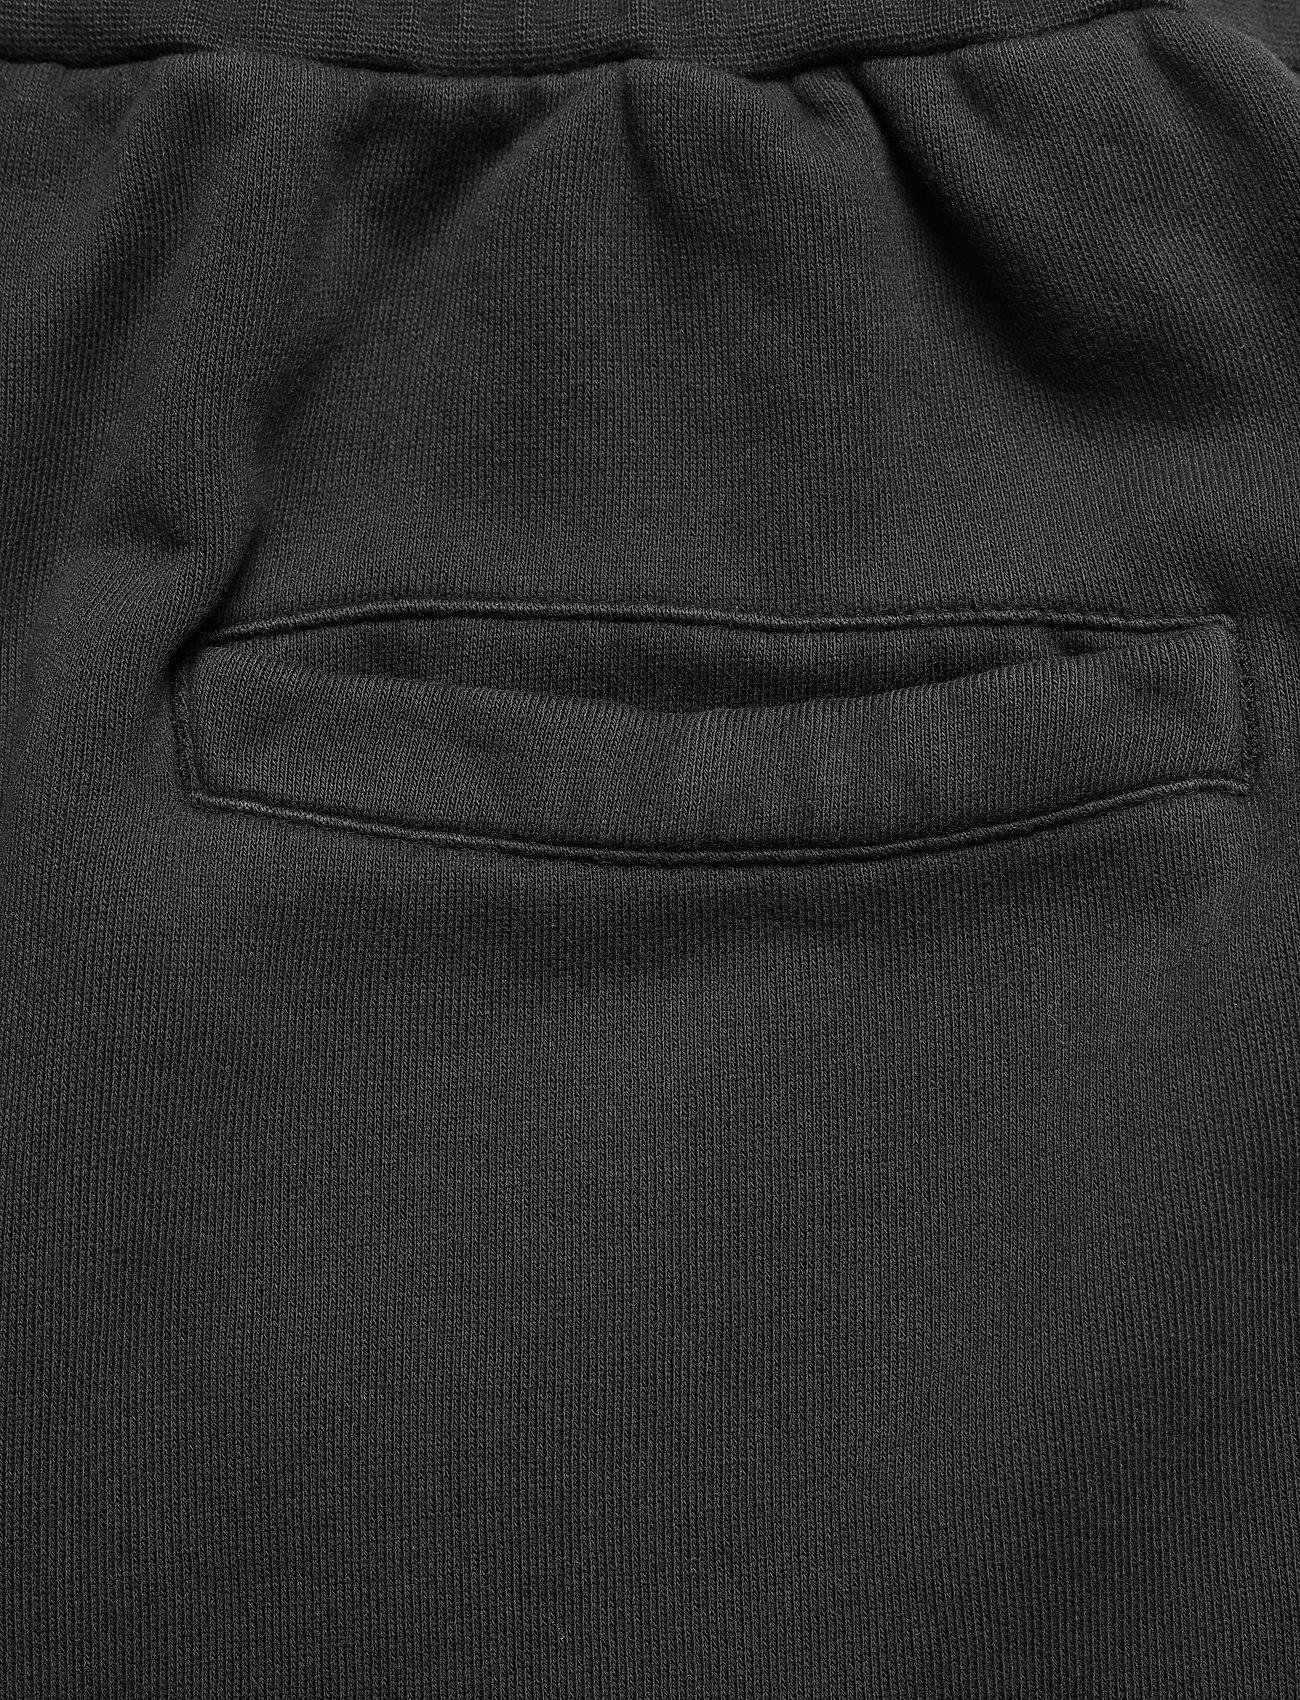 HAN Kjøbenhavn - Sweat Shorts - casual shorts - faded black - 7